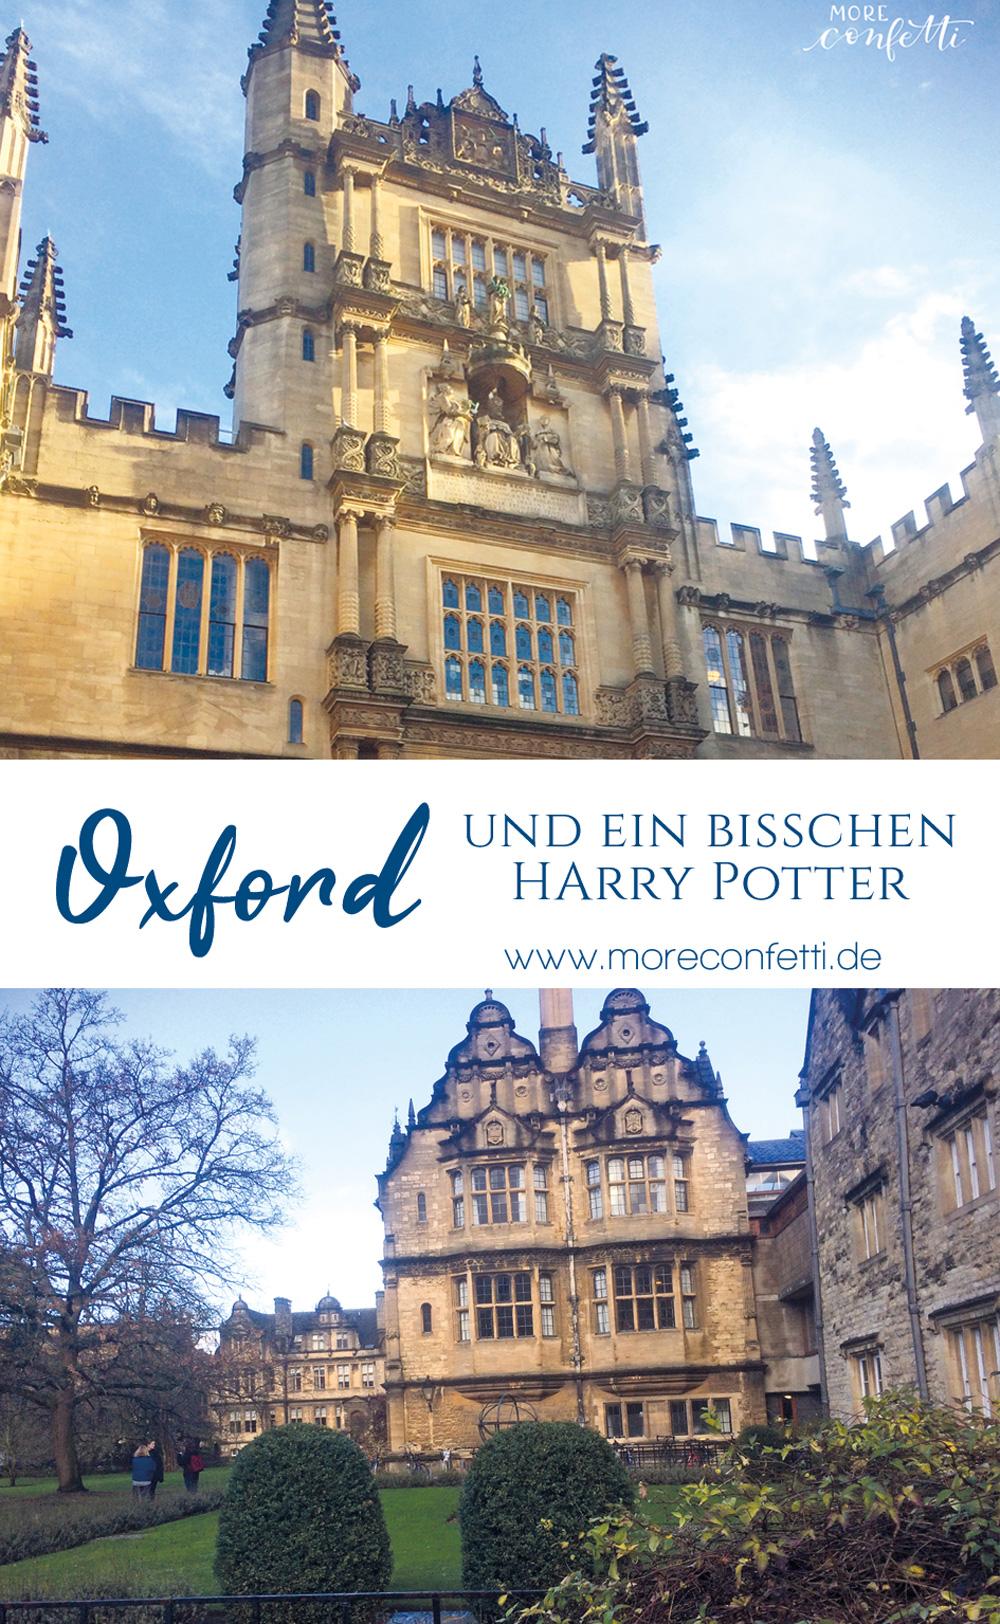 oxford - citytrip - Reise - moreconfetti.de